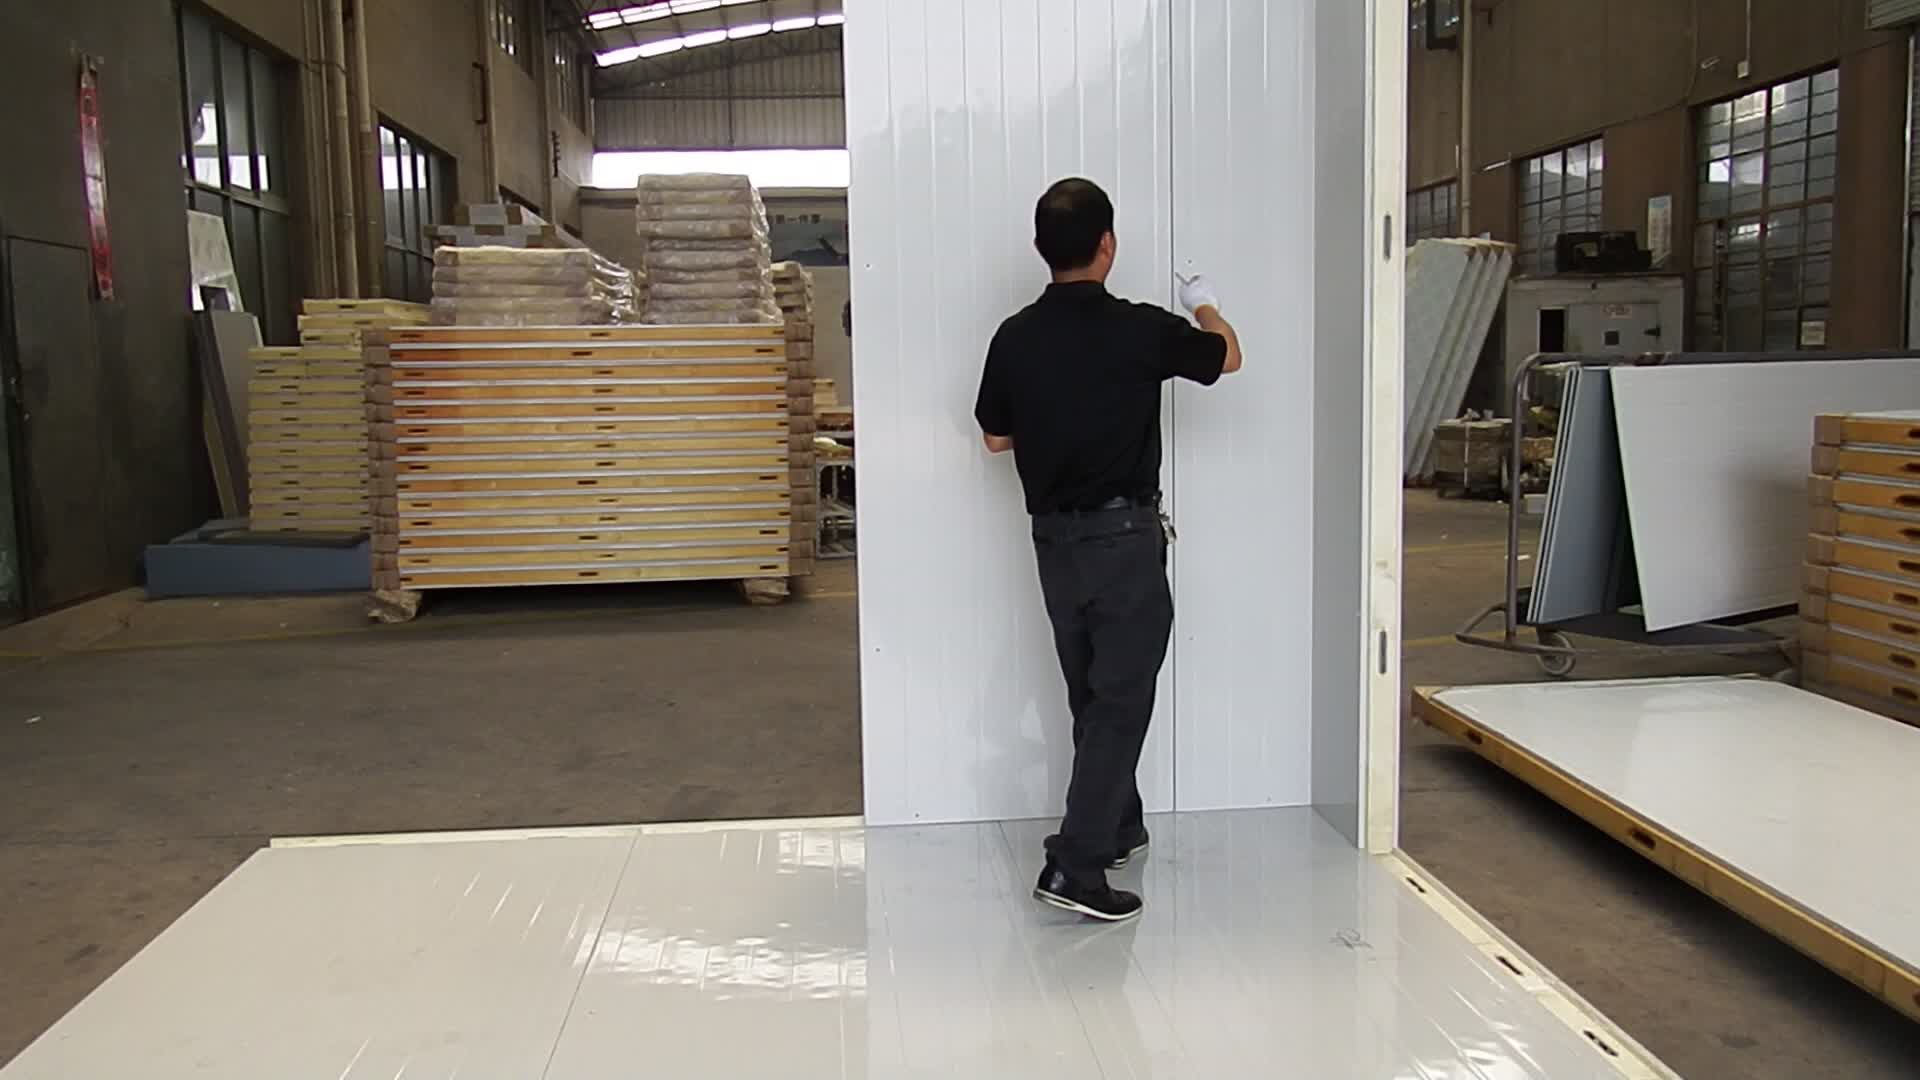 Niedrigen Preis Fertig Kühlraum Chiller Schockfroster Polyurethan Schaum Sandwich 120mm dicken PU Isolierung Wand Panels Preis